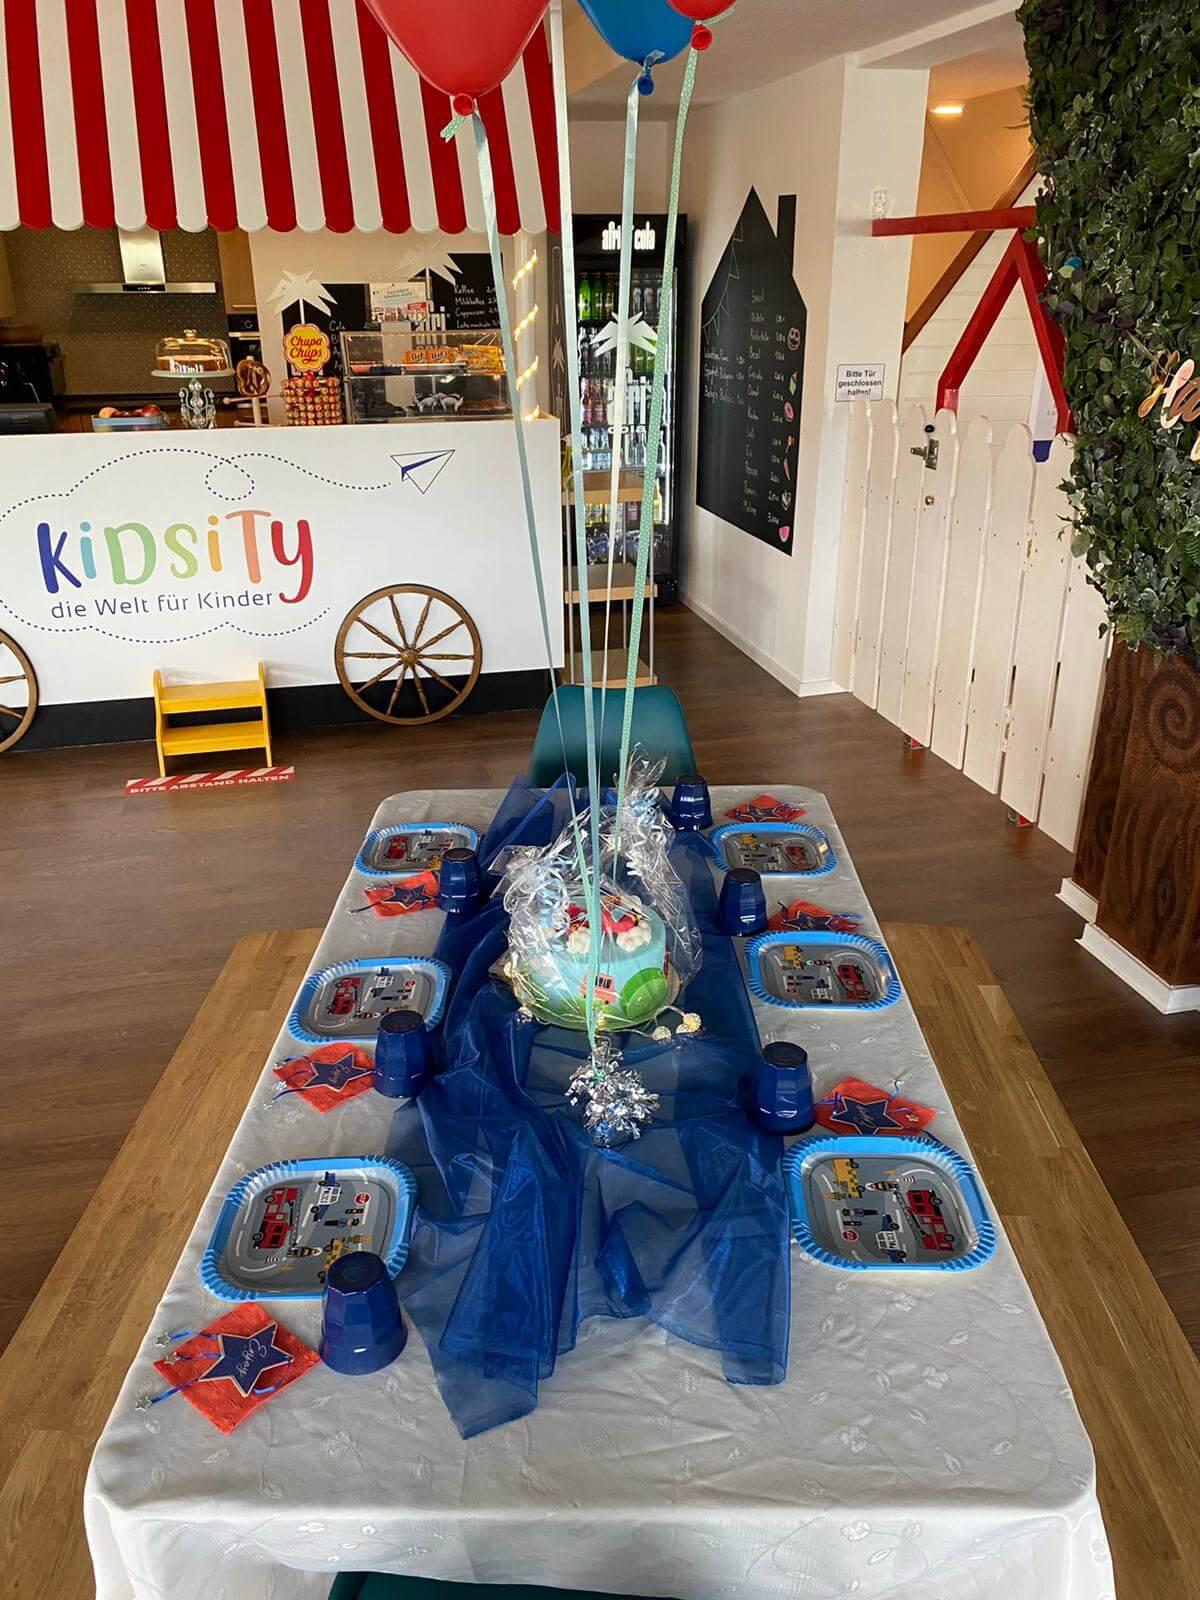 kidsity-geburtstag-kinder